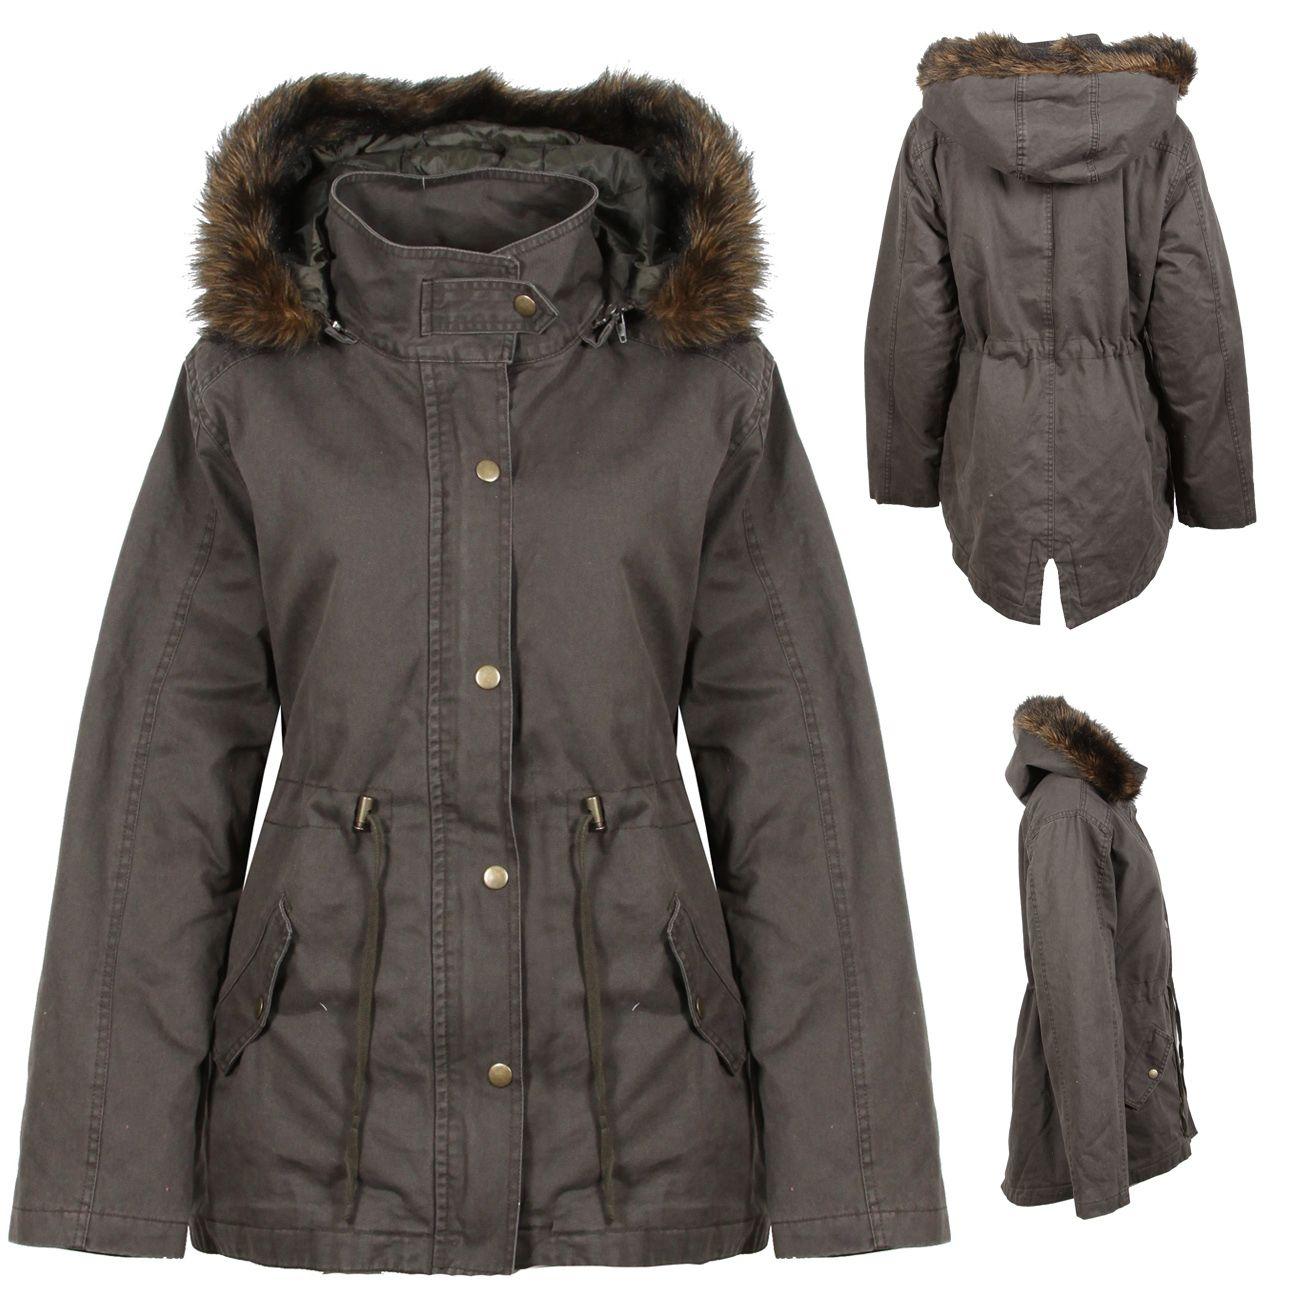 7483c84b7d2 Warm Winter Coats For Women